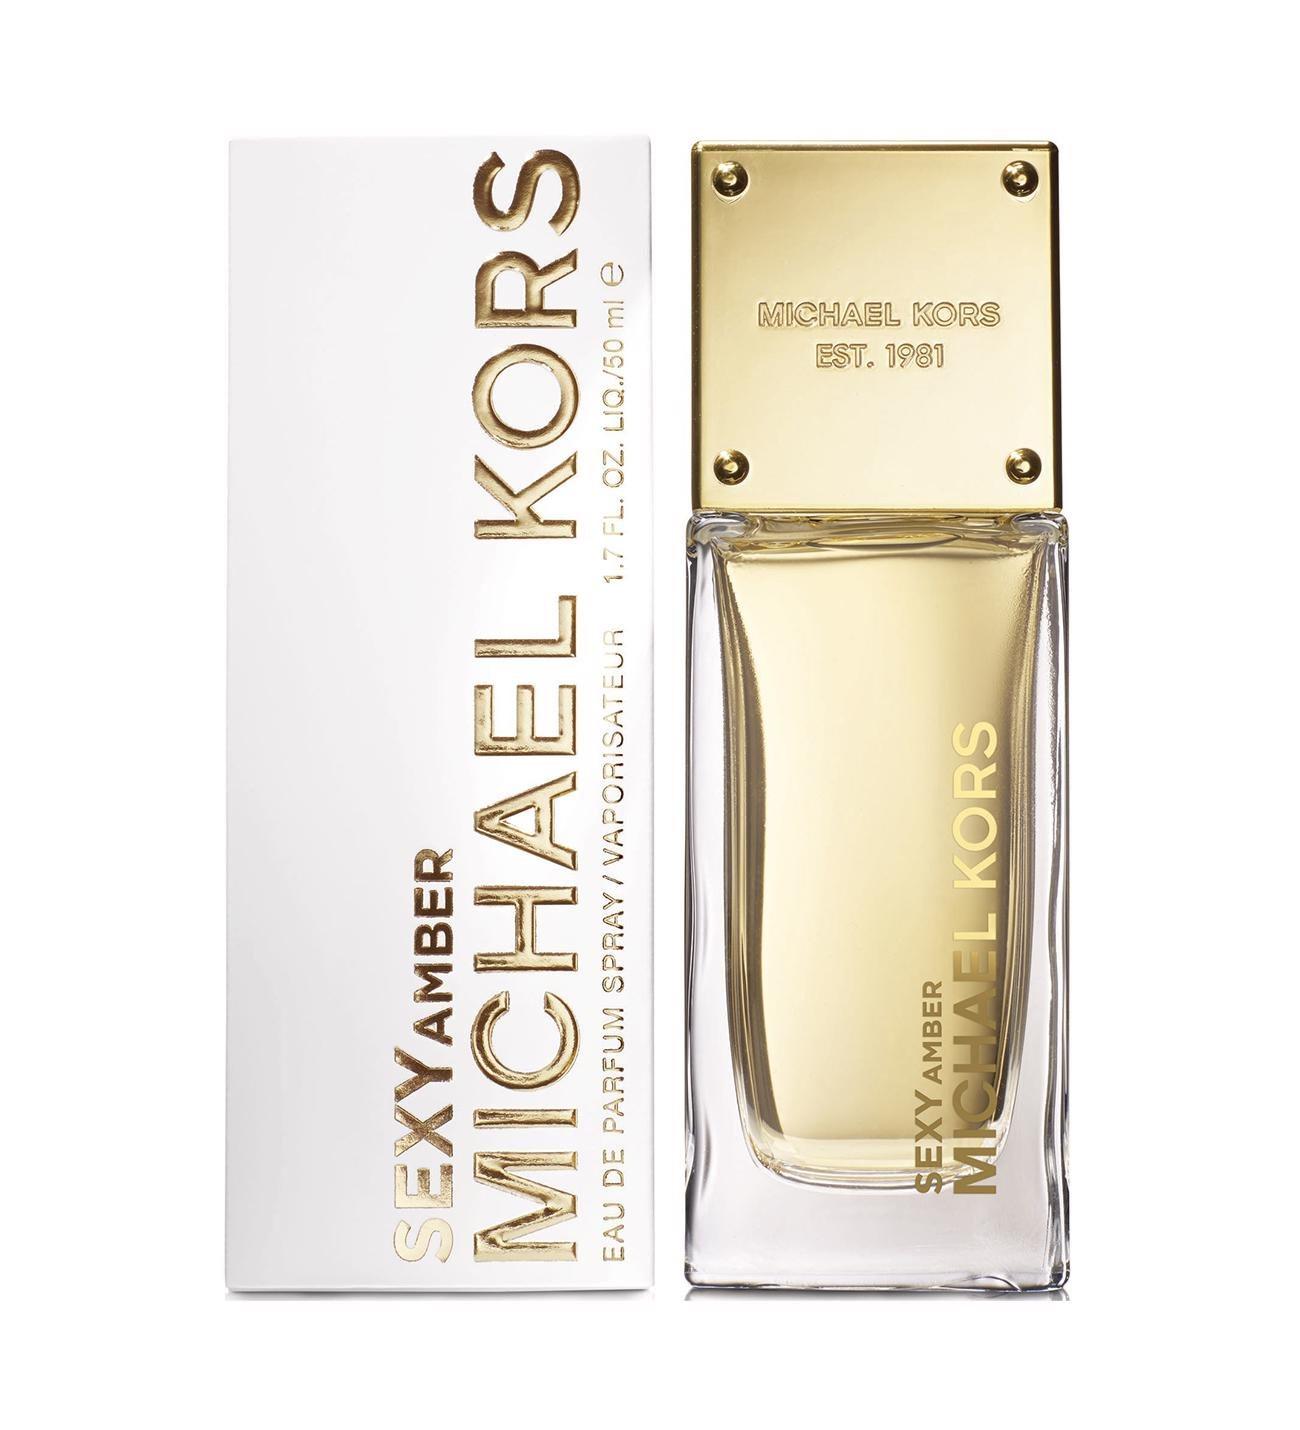 Michael Kors Sexy Amber Eau De Parfum 50ml + Free Michael Kors Card Case £29.99 delivered (members discount) @ The Perfume Shop